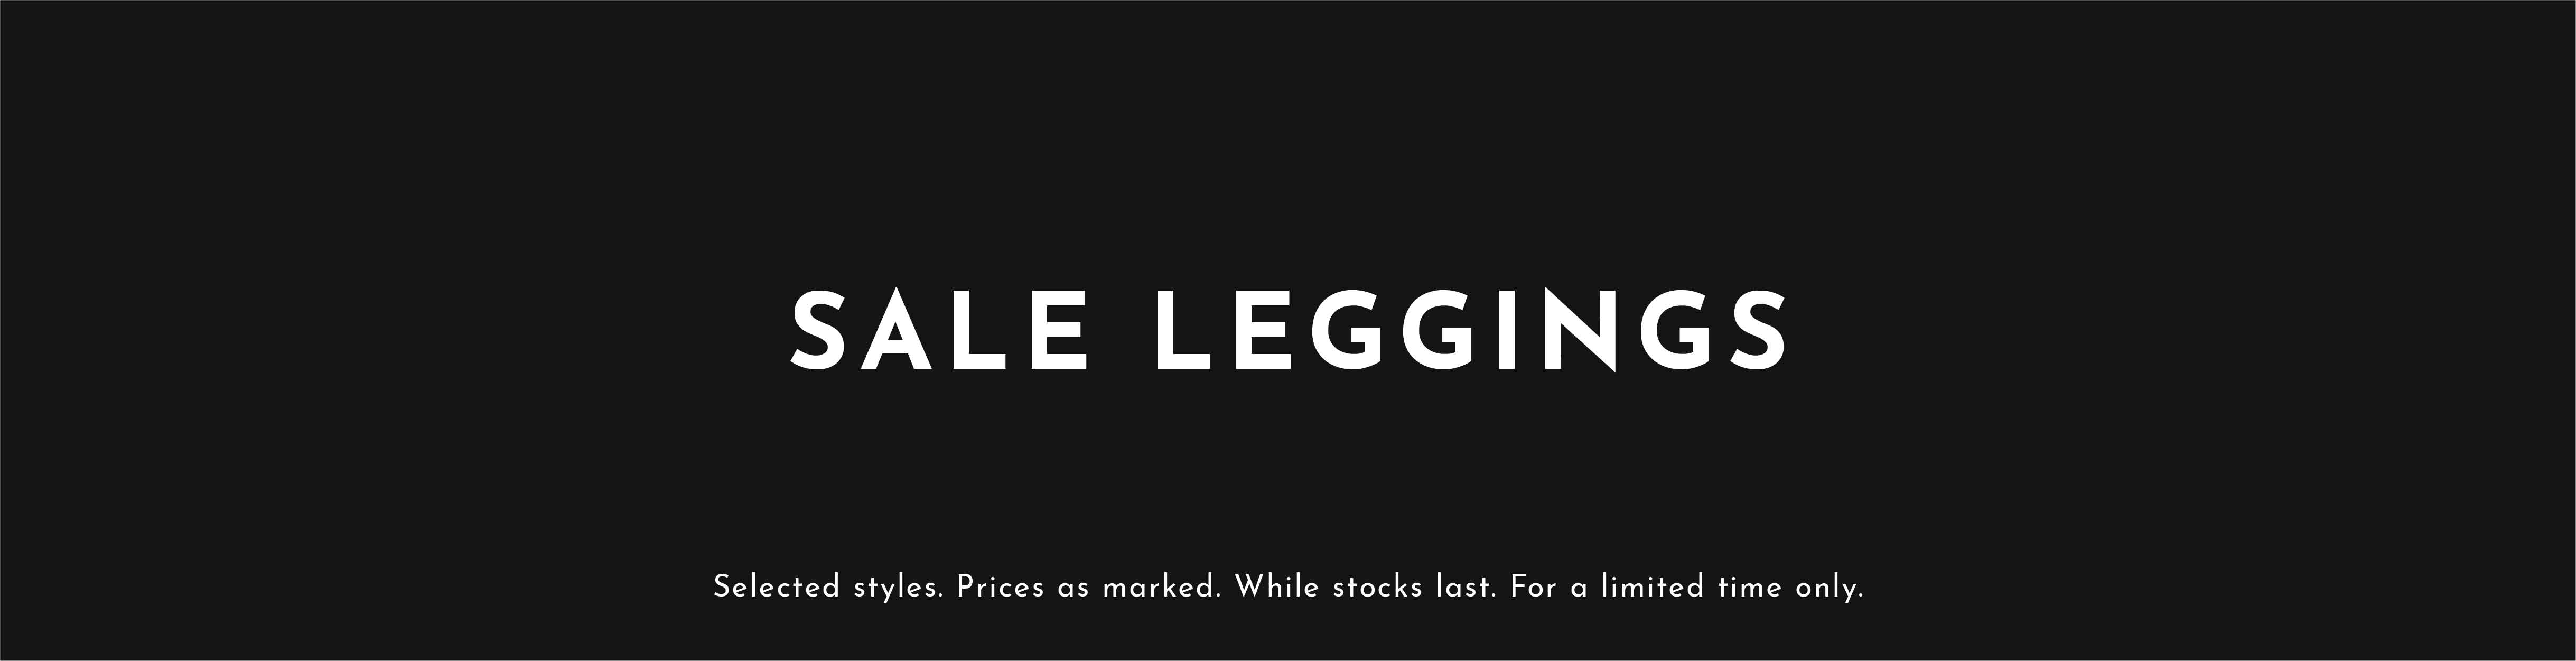 Sale Leggings